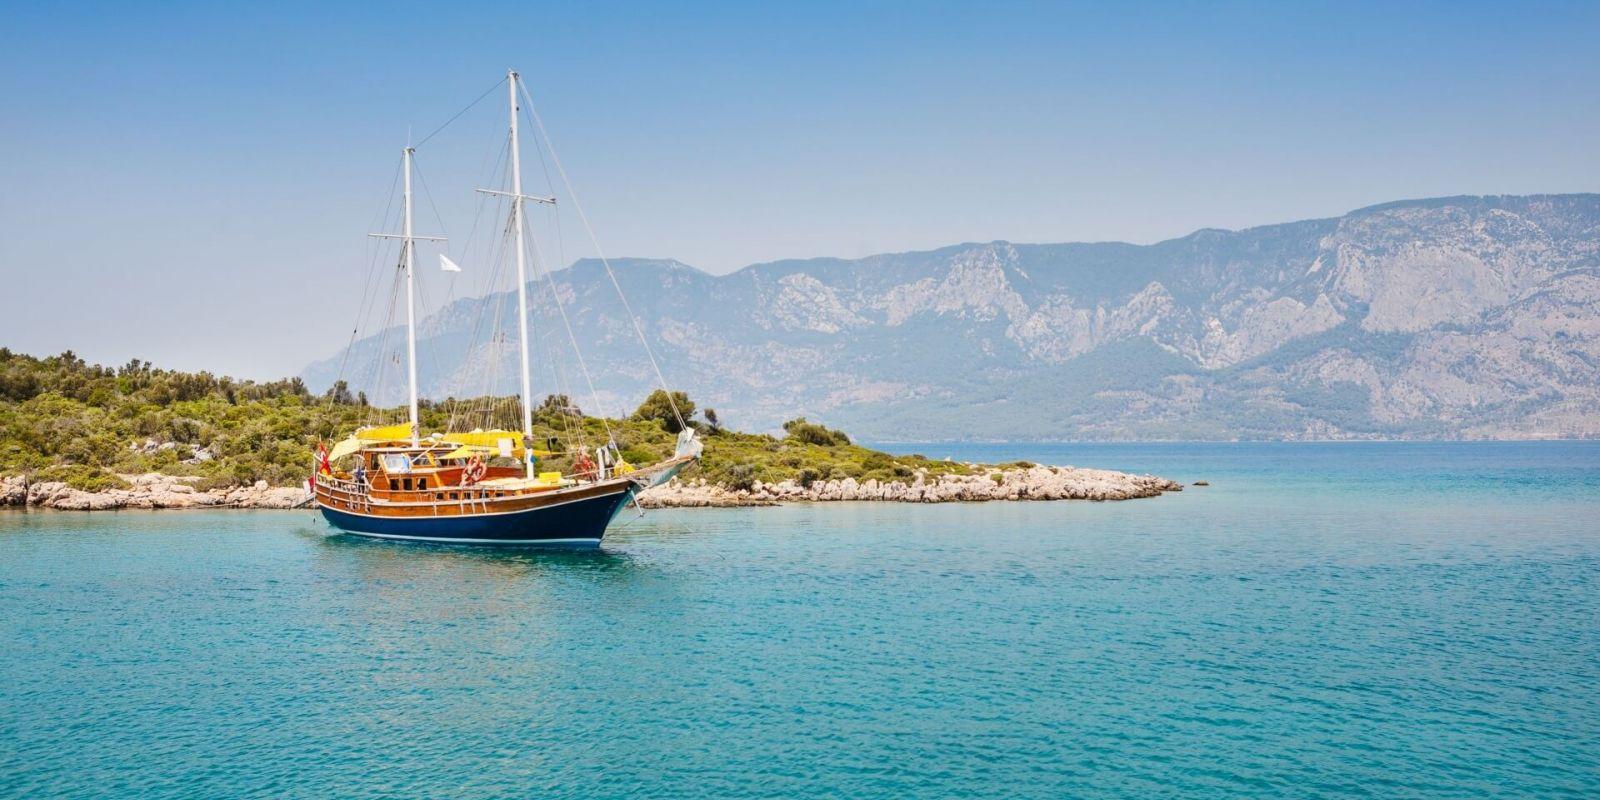 https://www.talamare.fr/medias/Location de yacht en Turquie, louer un yacht sur la Riviera turque